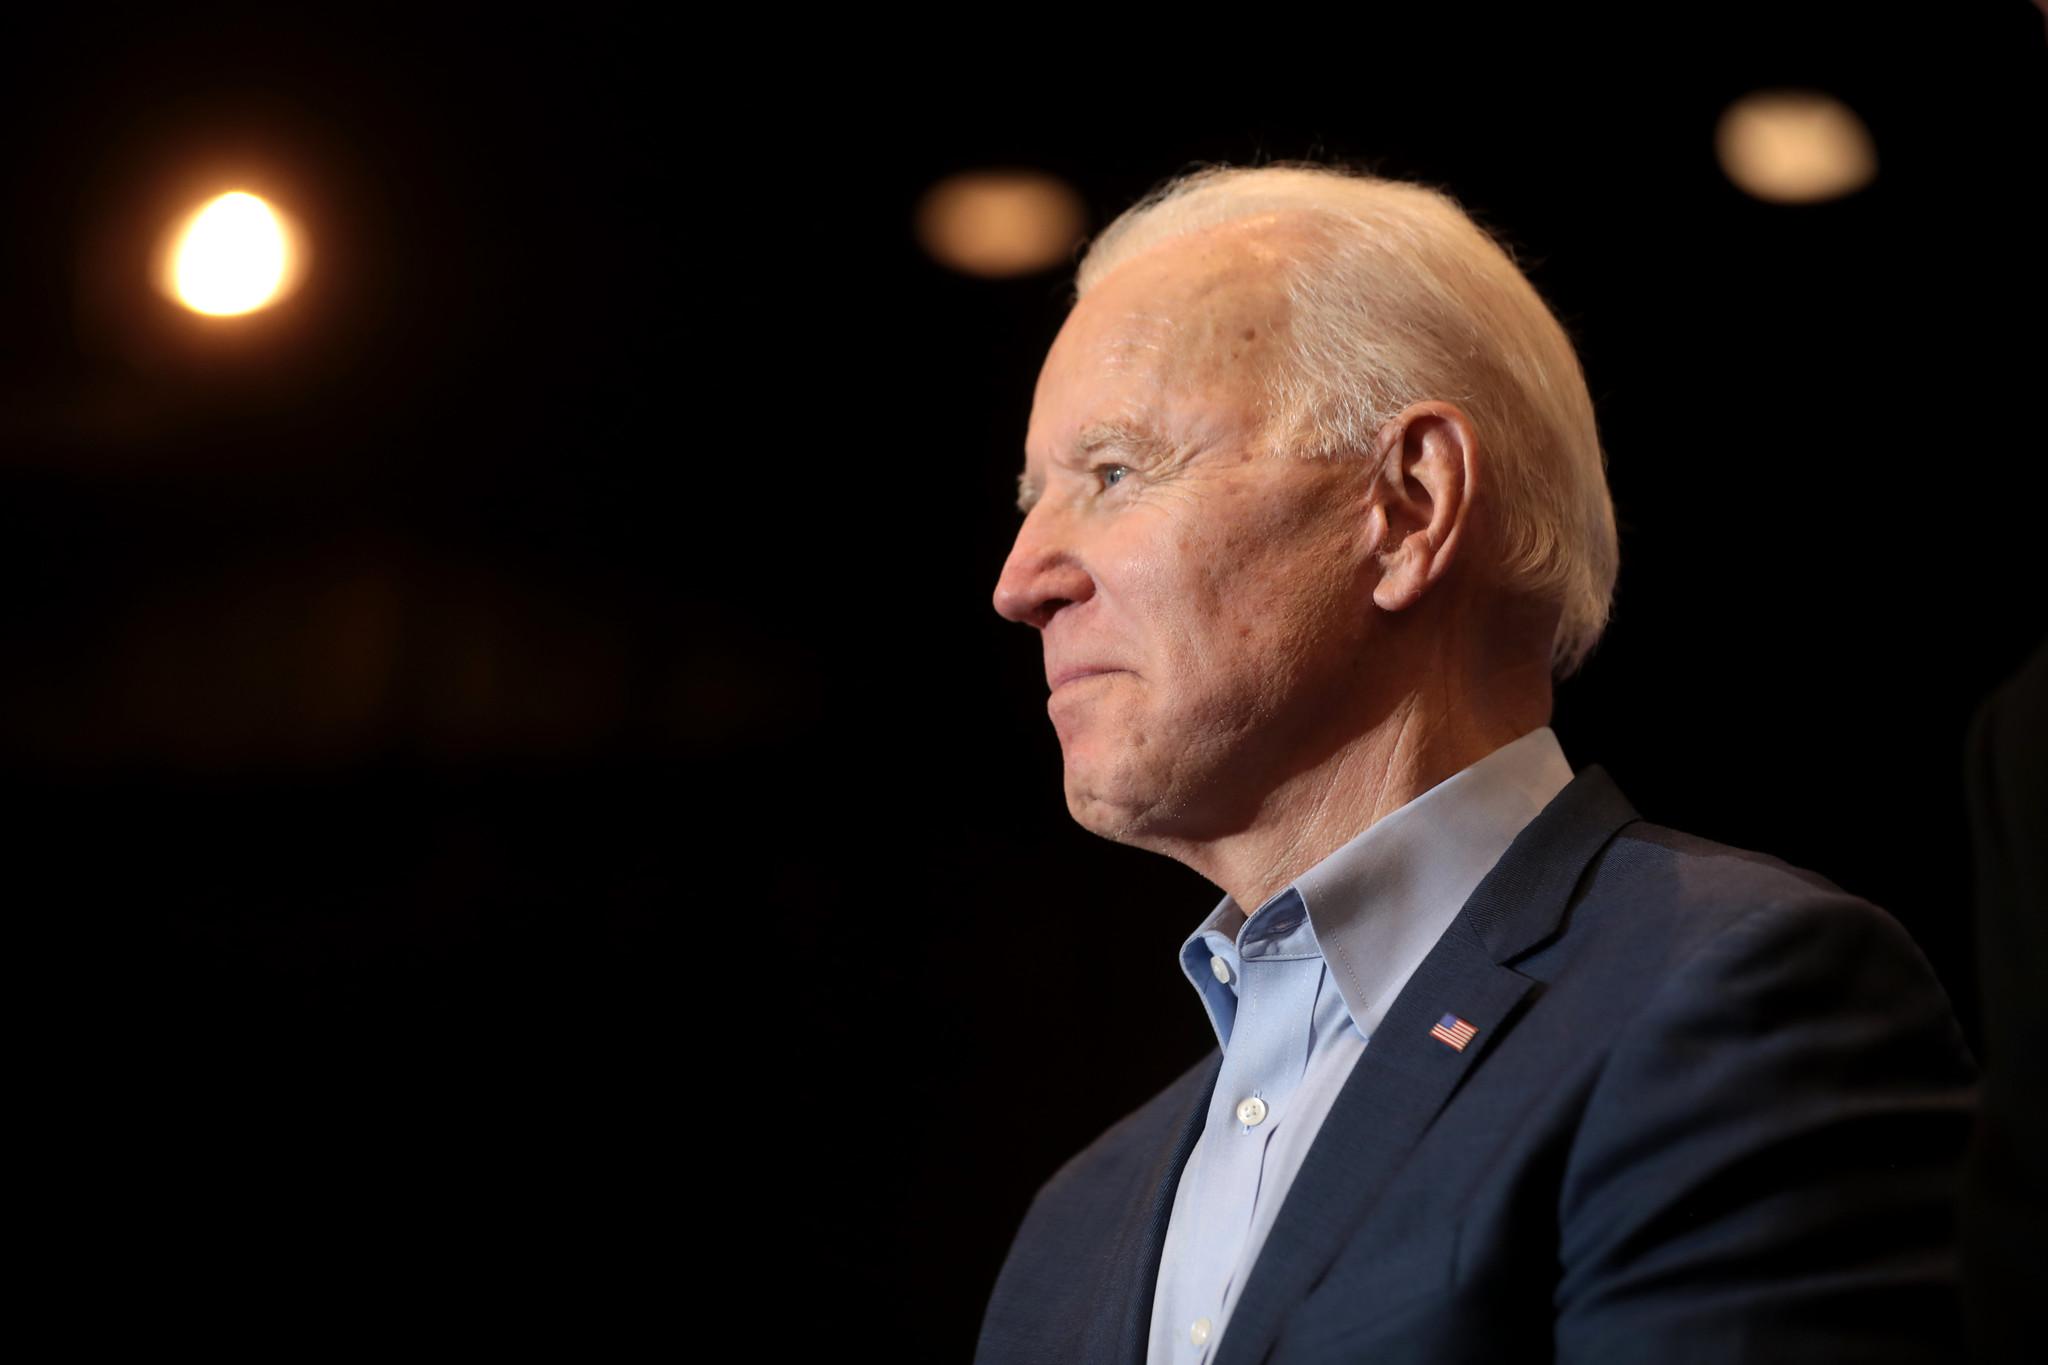 Joe Biden attends a pre-election event in Nevada.